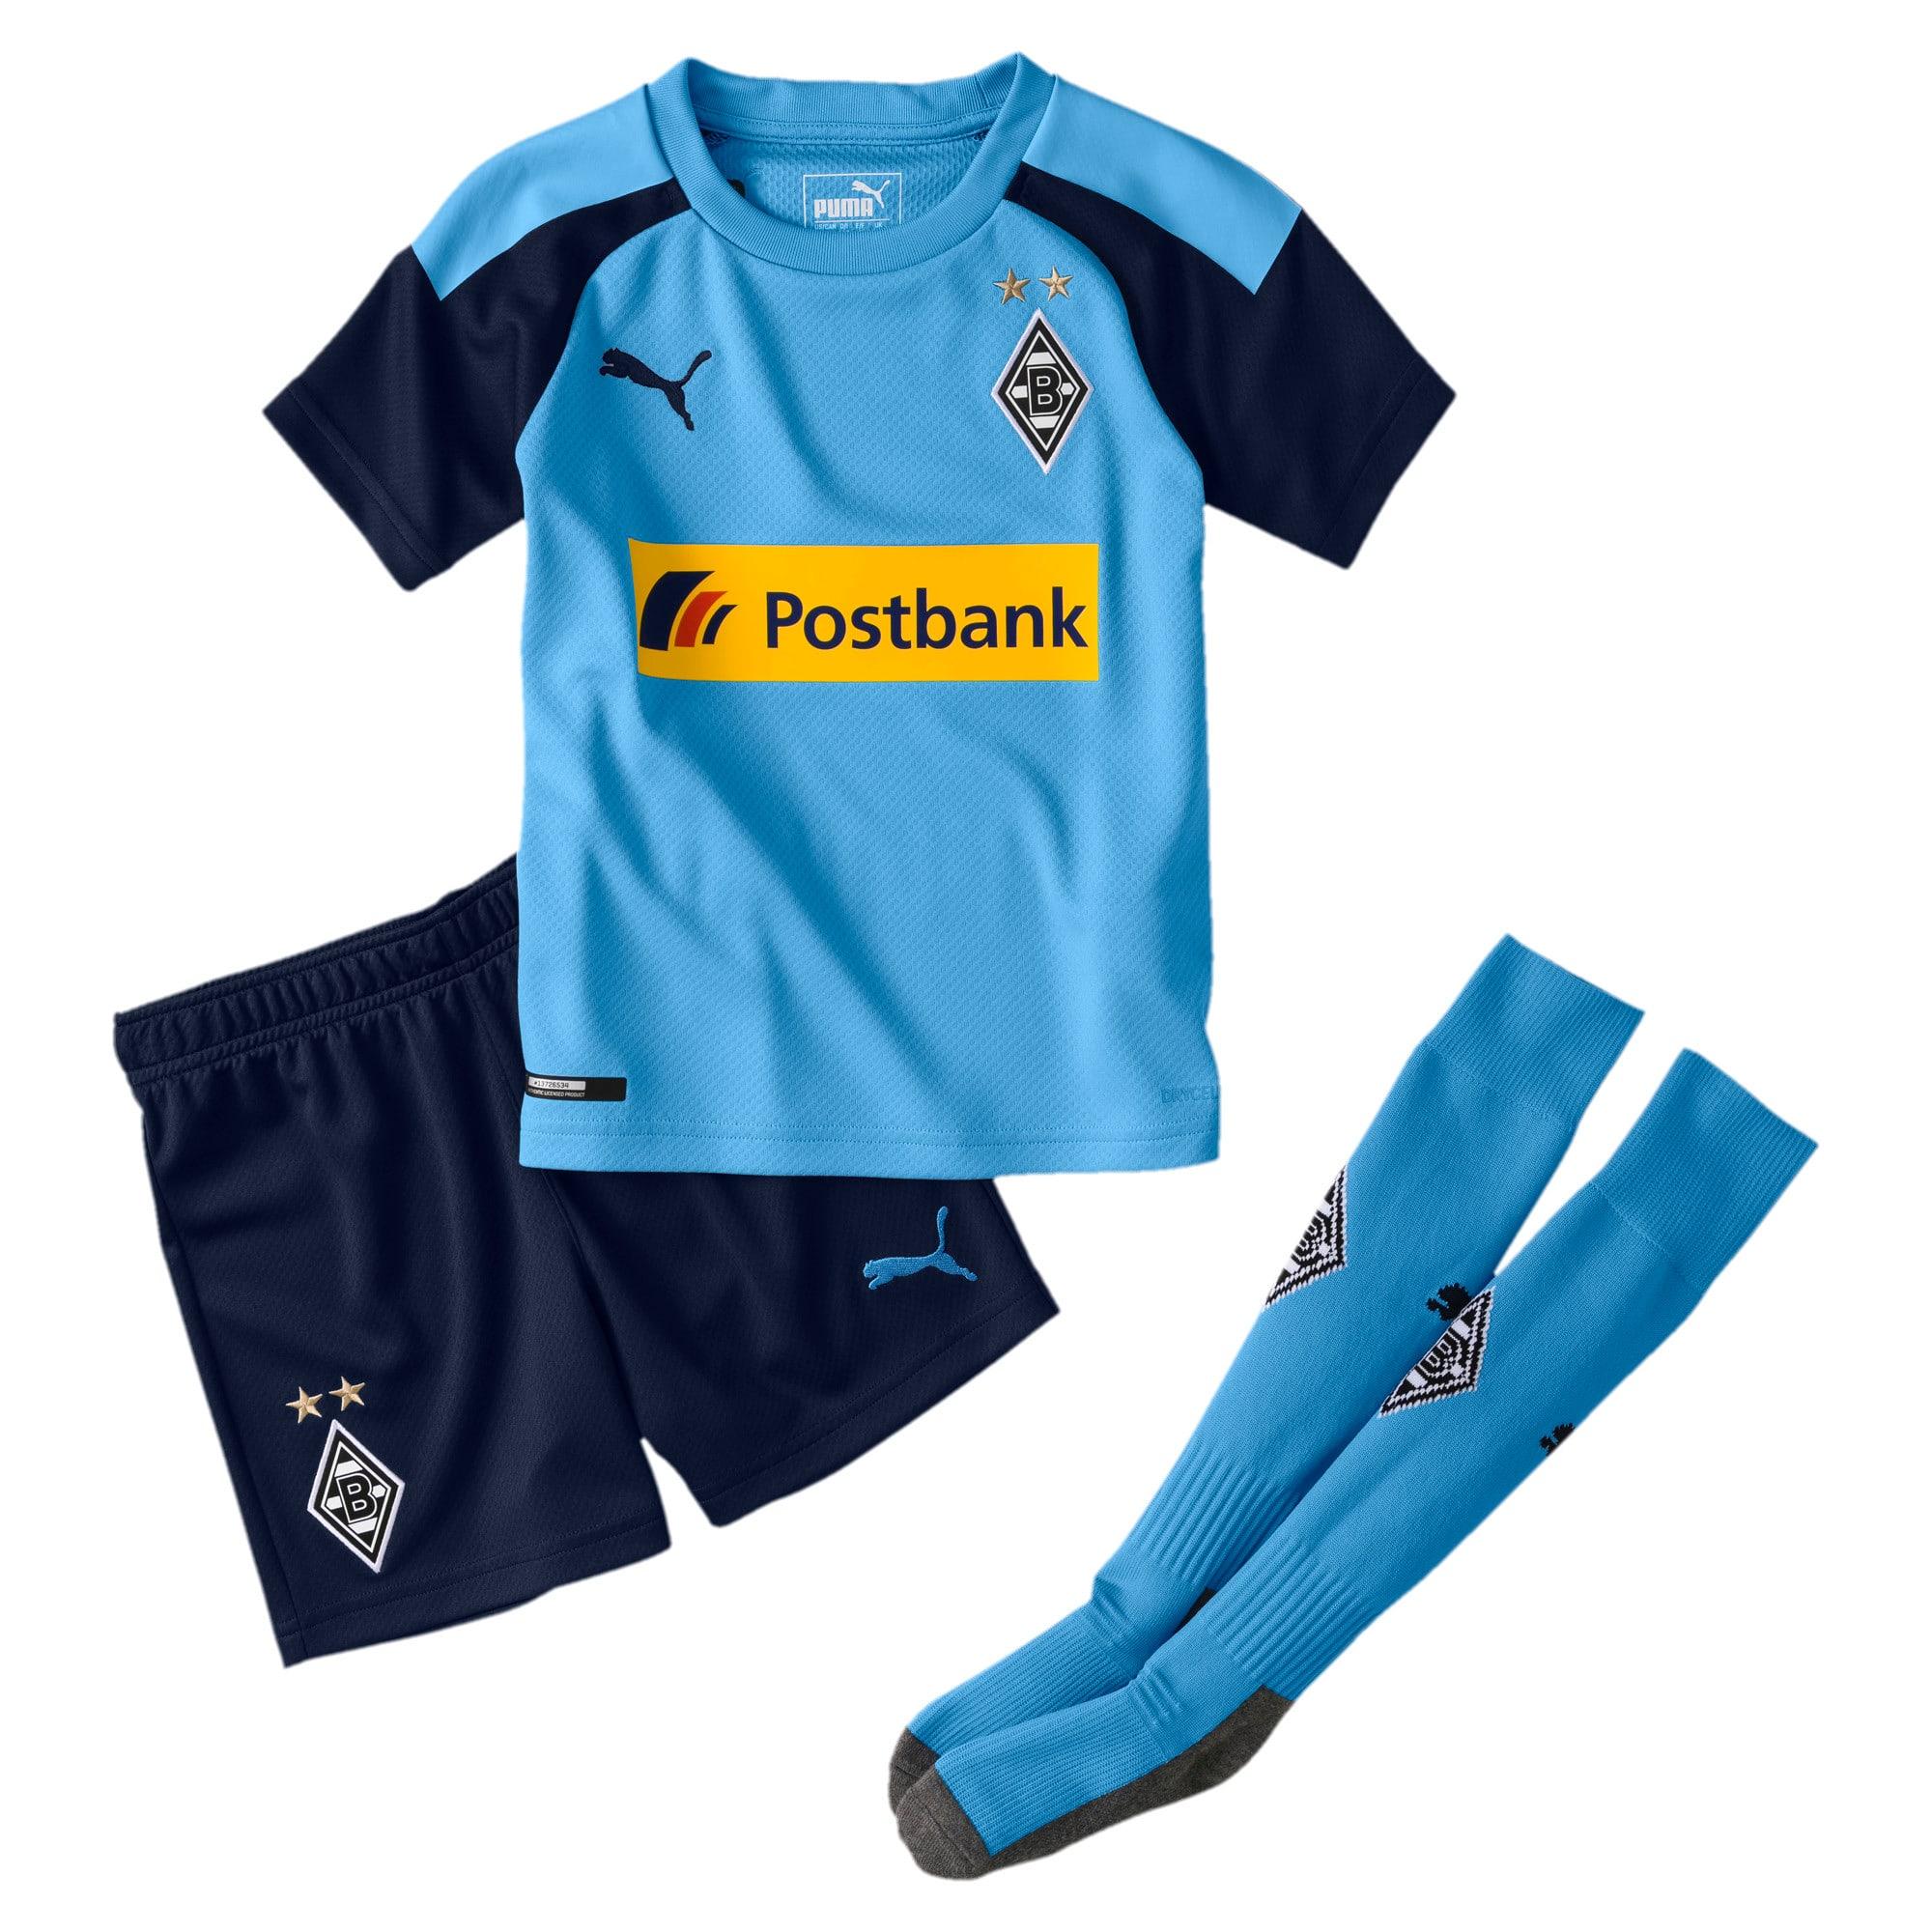 Thumbnail 1 of Borussia Mönchengladbach Kinder Auswärts Mini Set, Team Light Blue-Peacoat, medium